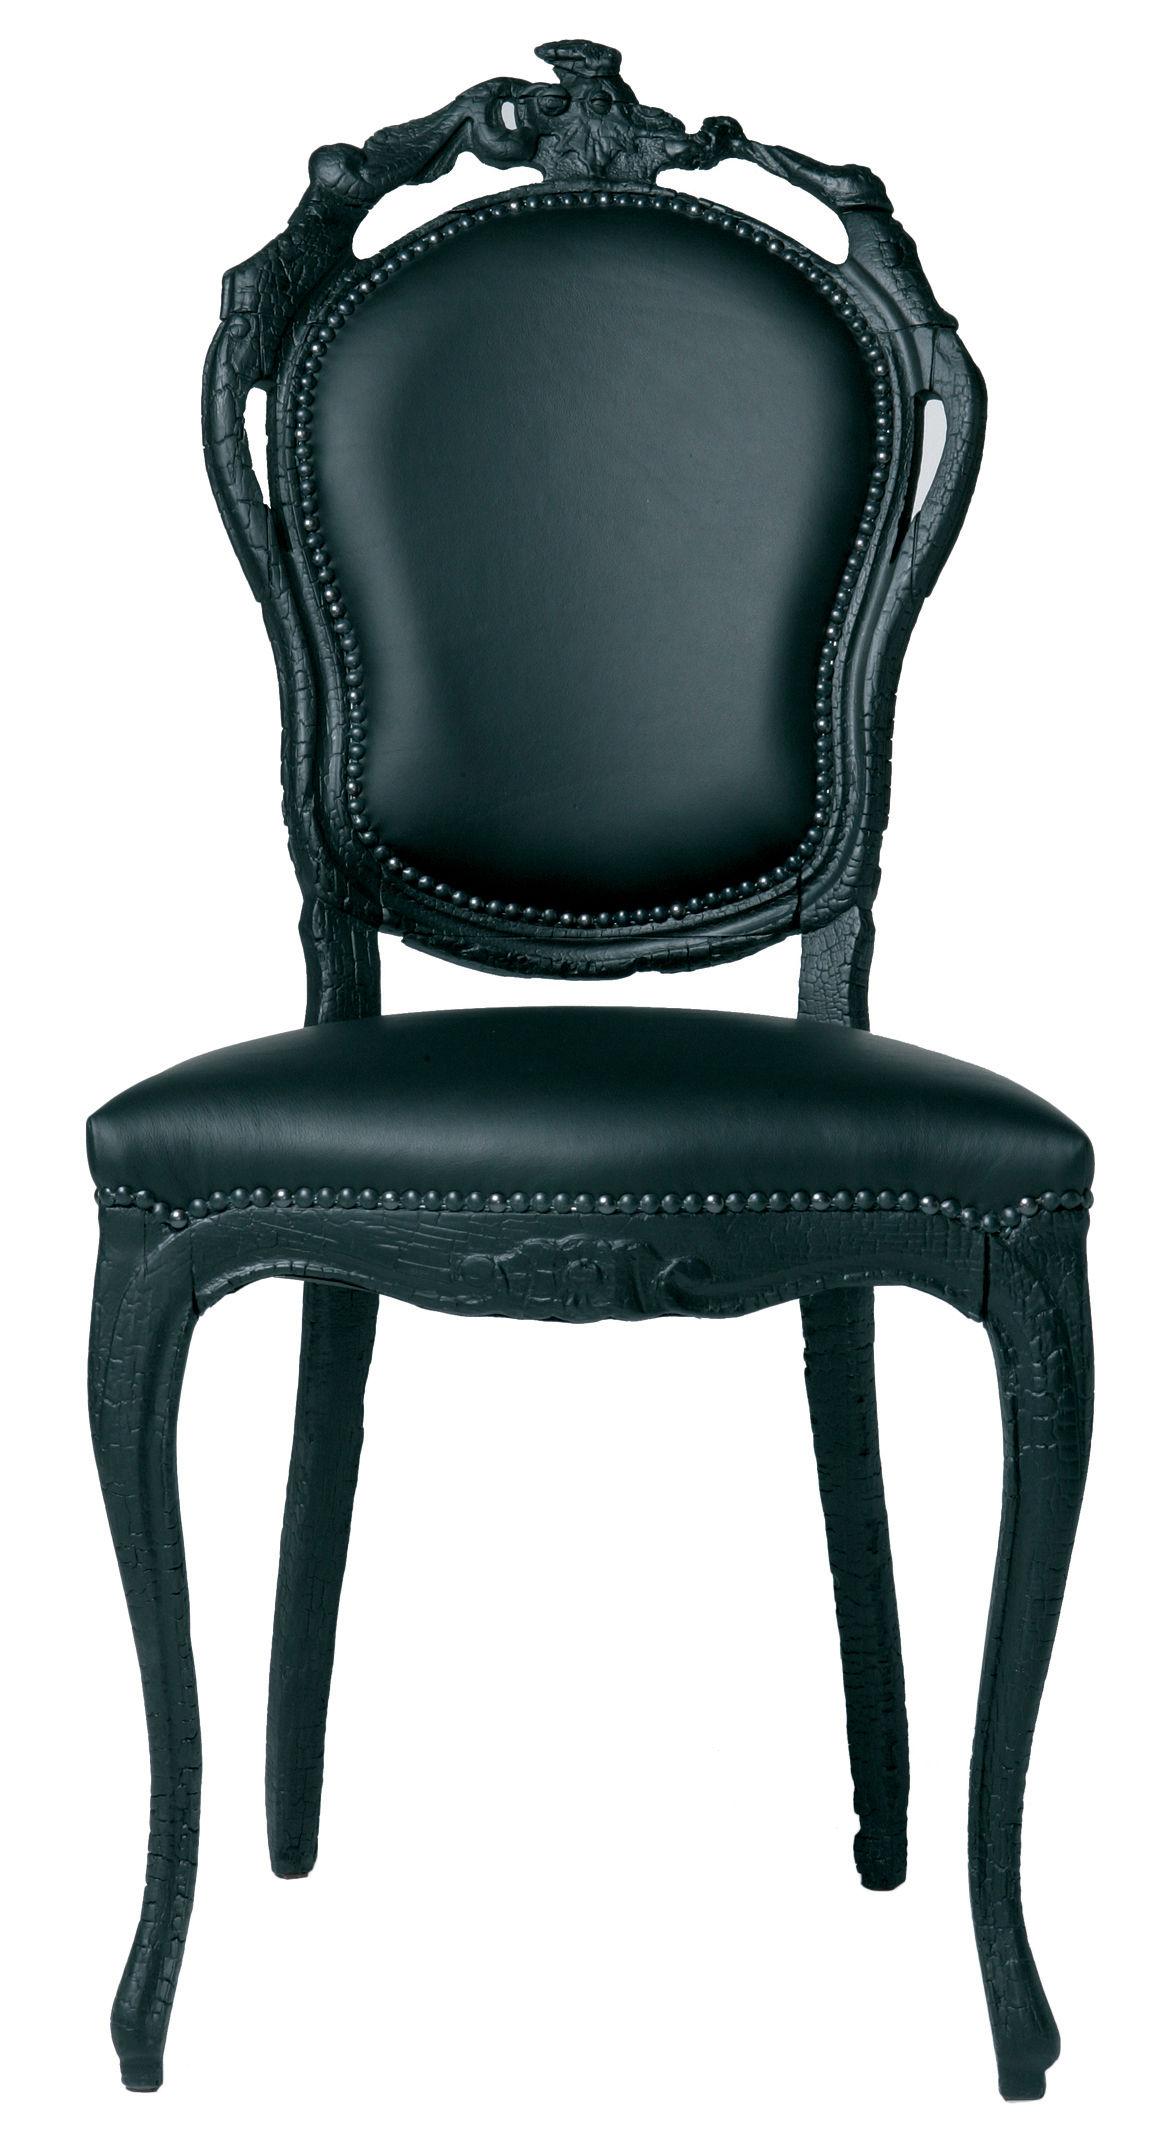 chaise rembourr e smoke chair bois cuir noir moooi. Black Bedroom Furniture Sets. Home Design Ideas